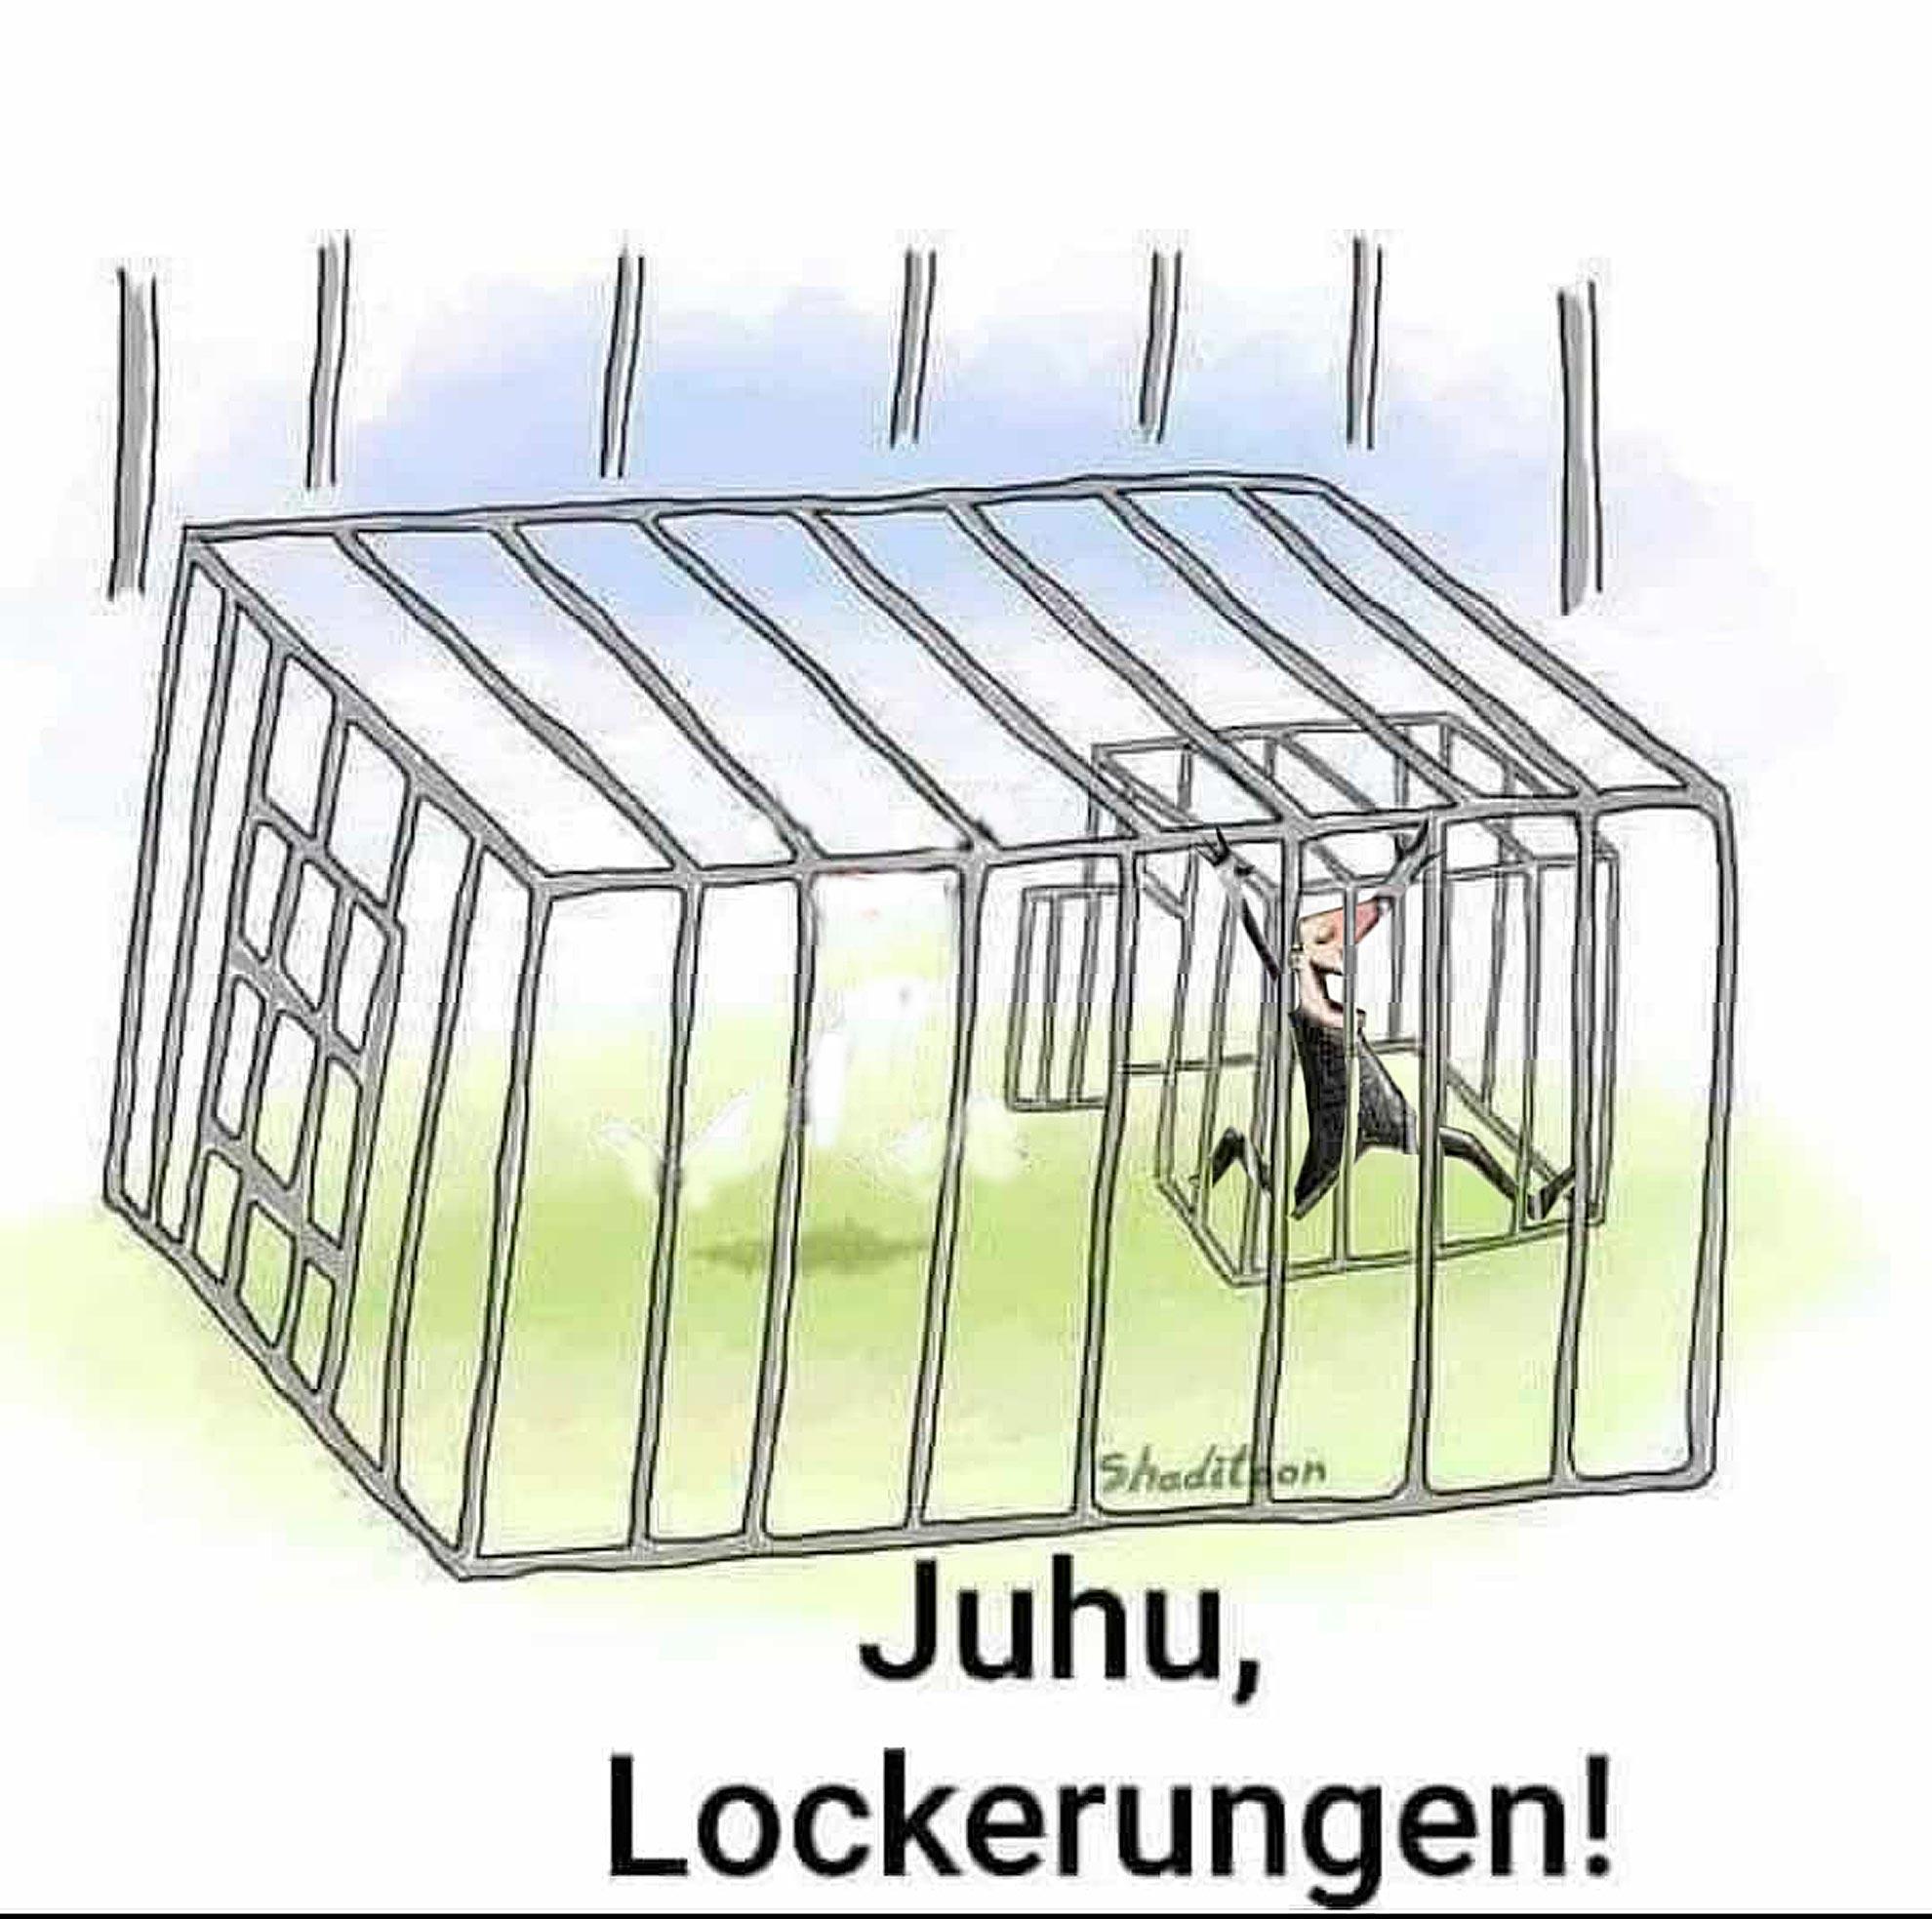 Juhu Lockerungen